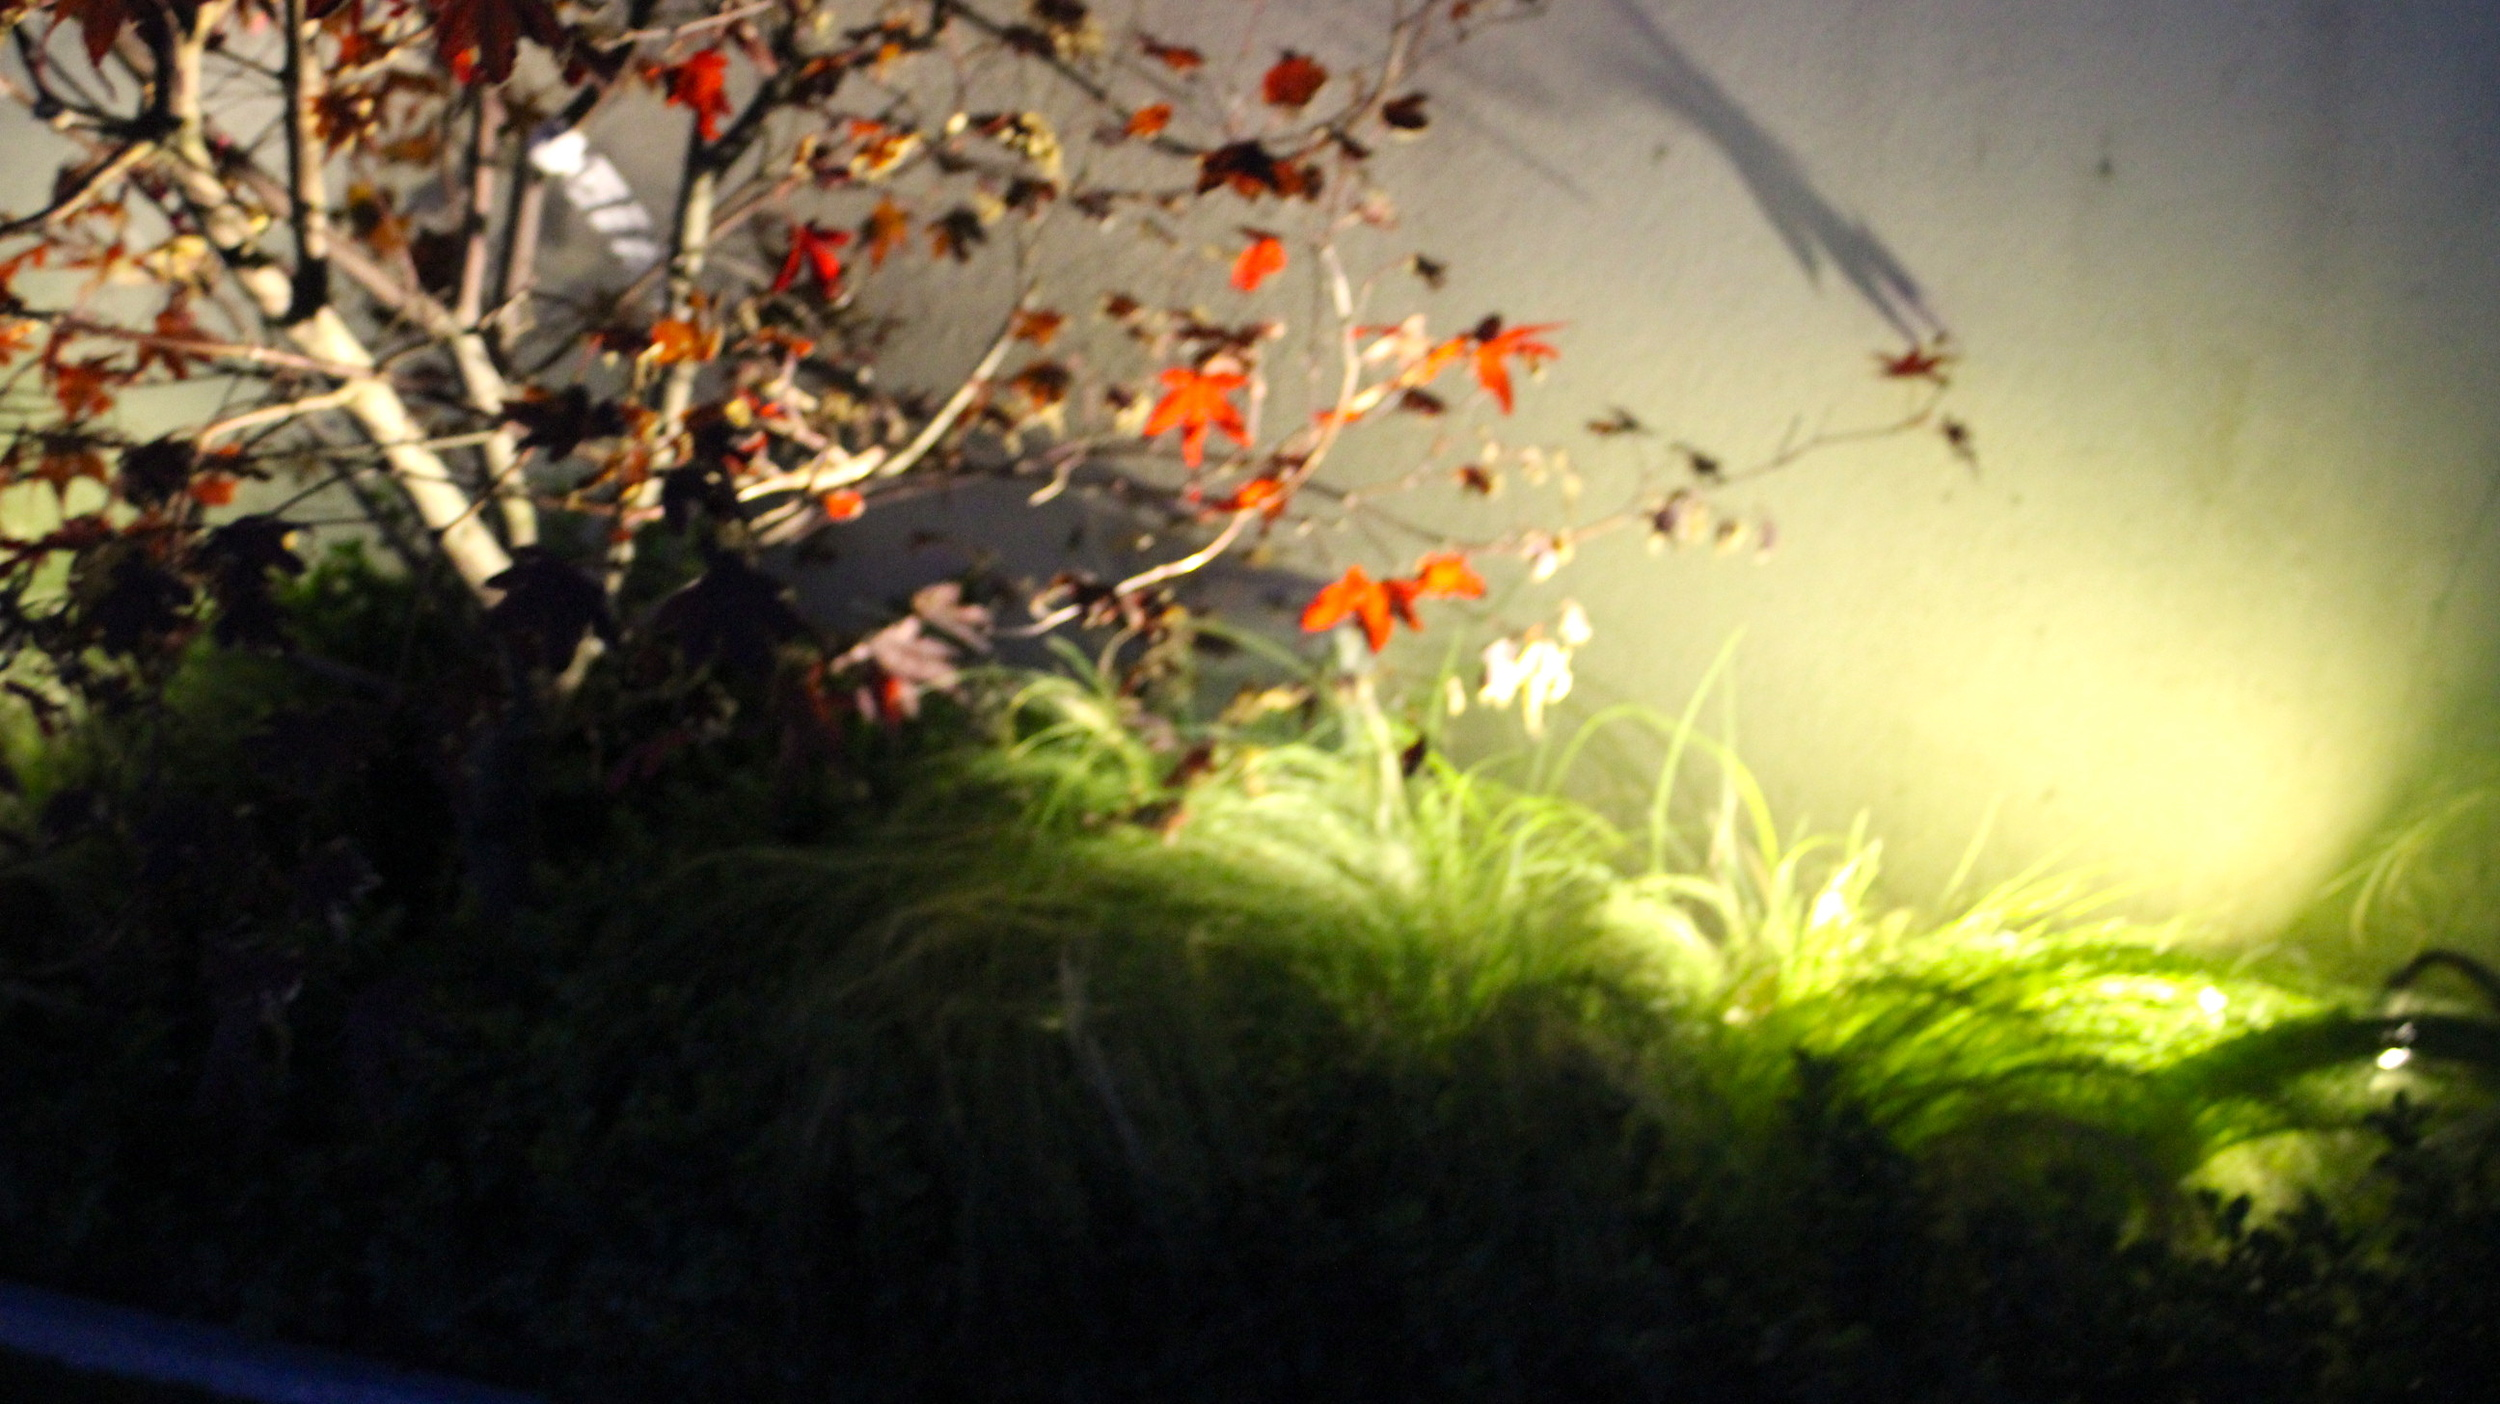 ACER Japonica and Lights